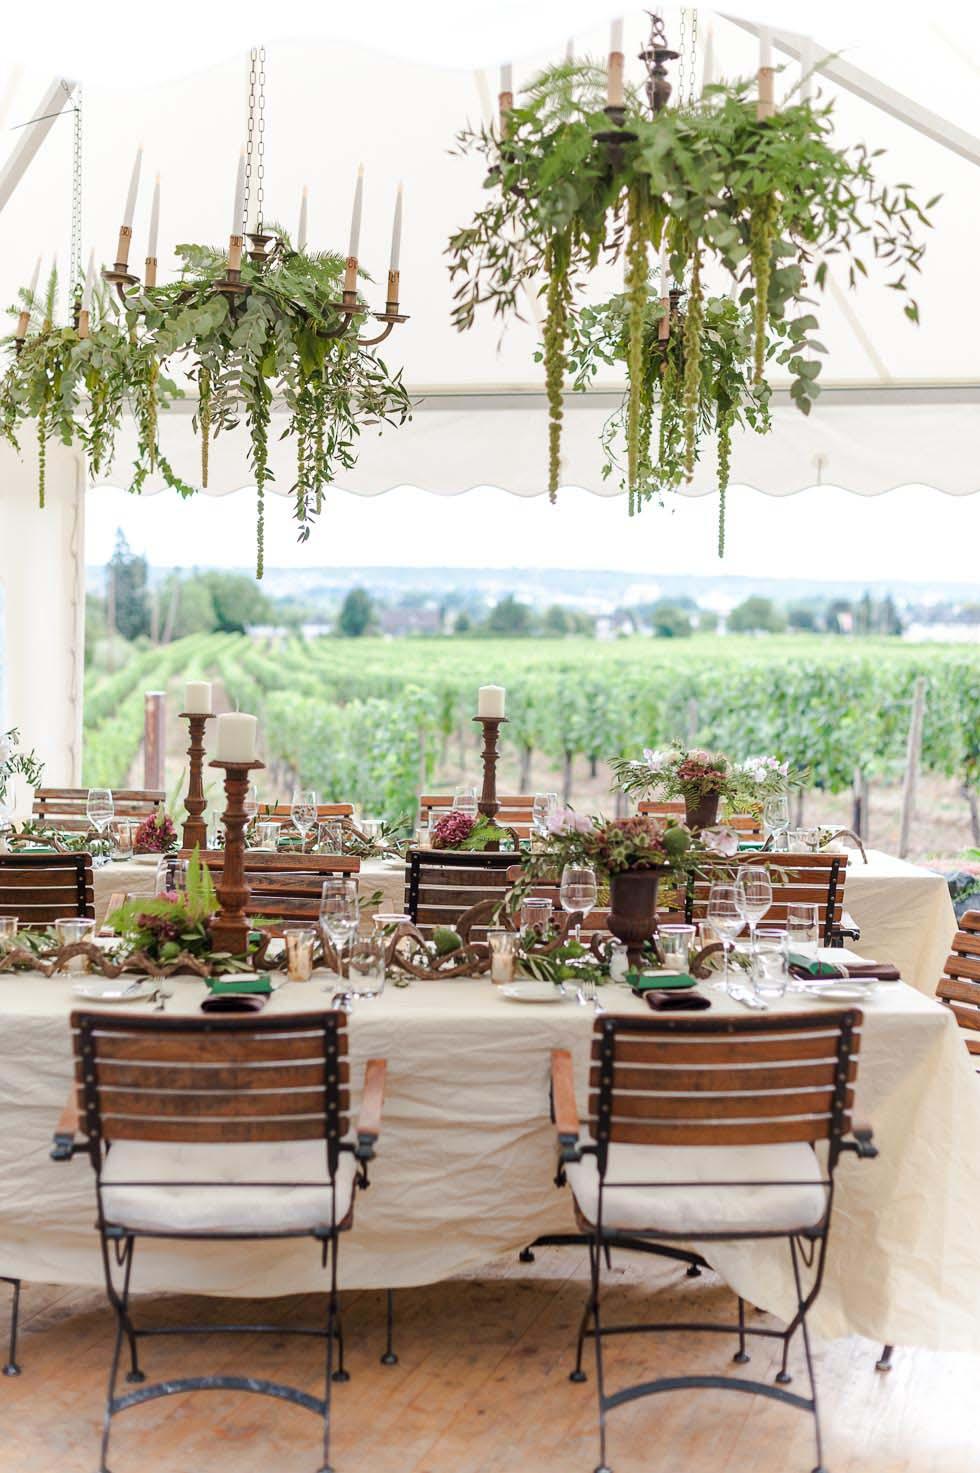 Tischdekoration bei www.weddingstyle.de | Foto: von [blickfang] Event Design